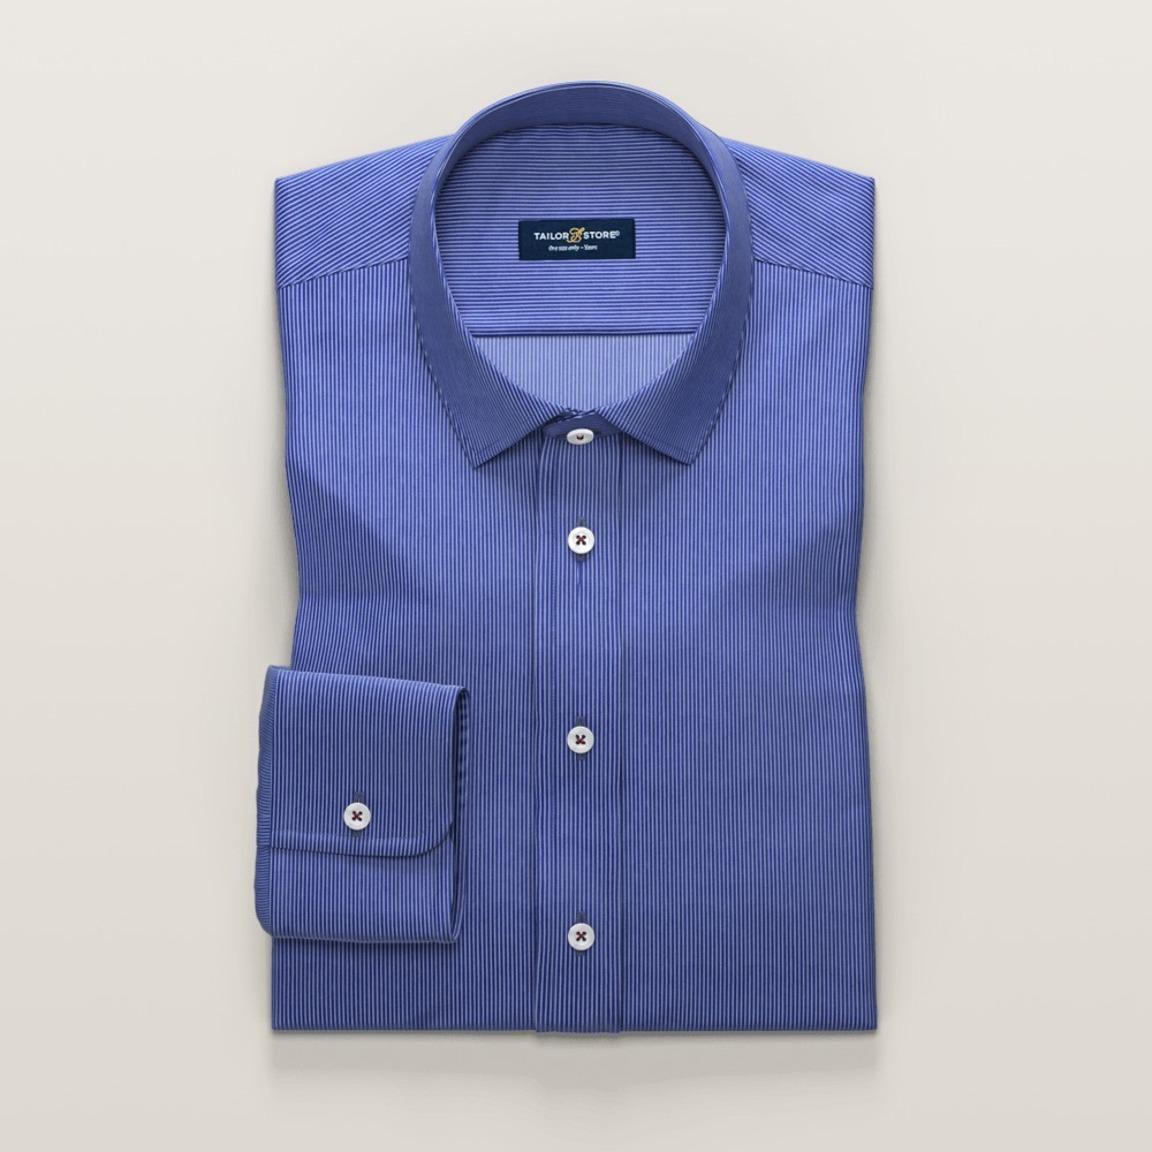 Blue business dress shirt with stripes